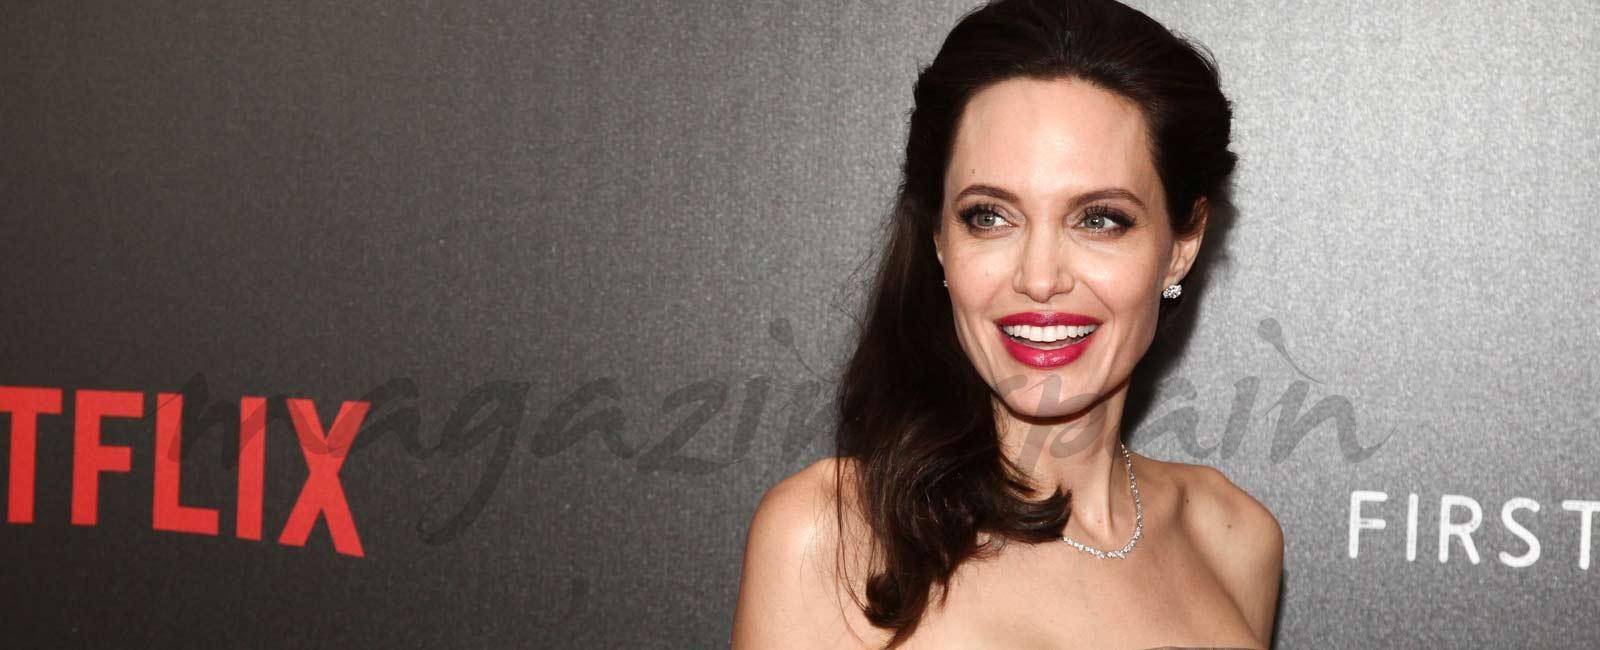 Angelina Jolie ¿enamorada del doble rejuvenecido de Brad Pitt?